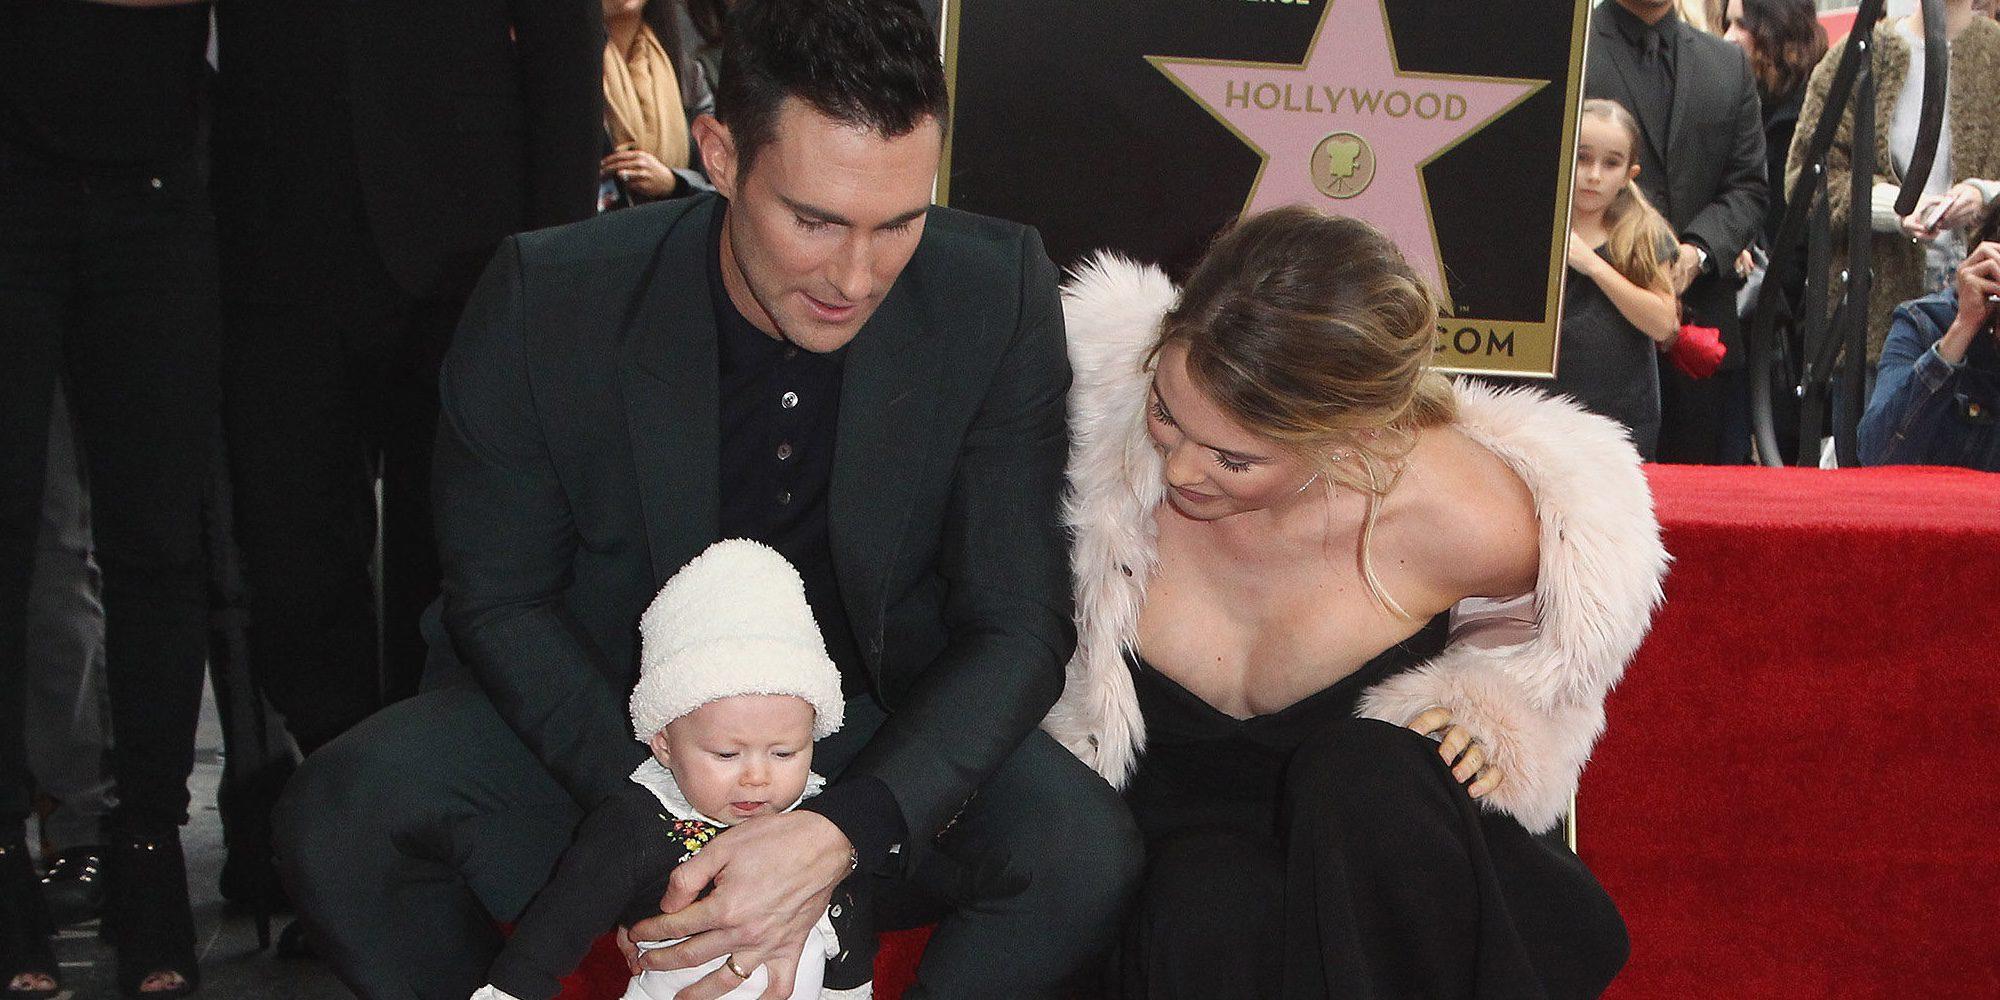 Adam Levine y la modelo Behati Prinsloo esperan su segundo hijo